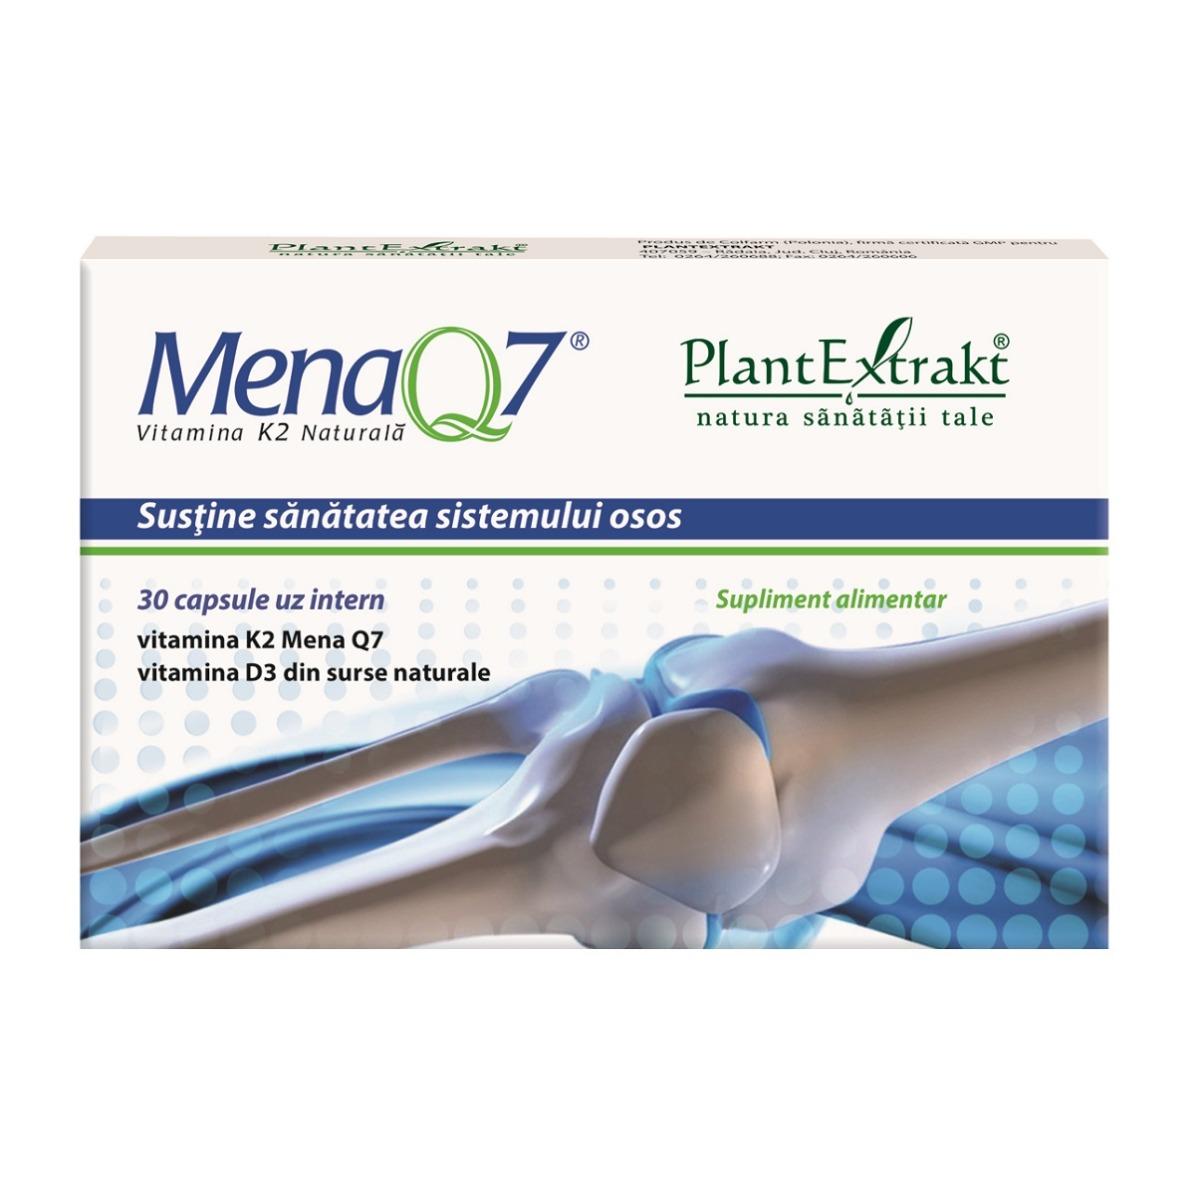 Mena Q7 vitamina K2 naturala, 30 capsule, Plant Extrakt imagine produs 2021